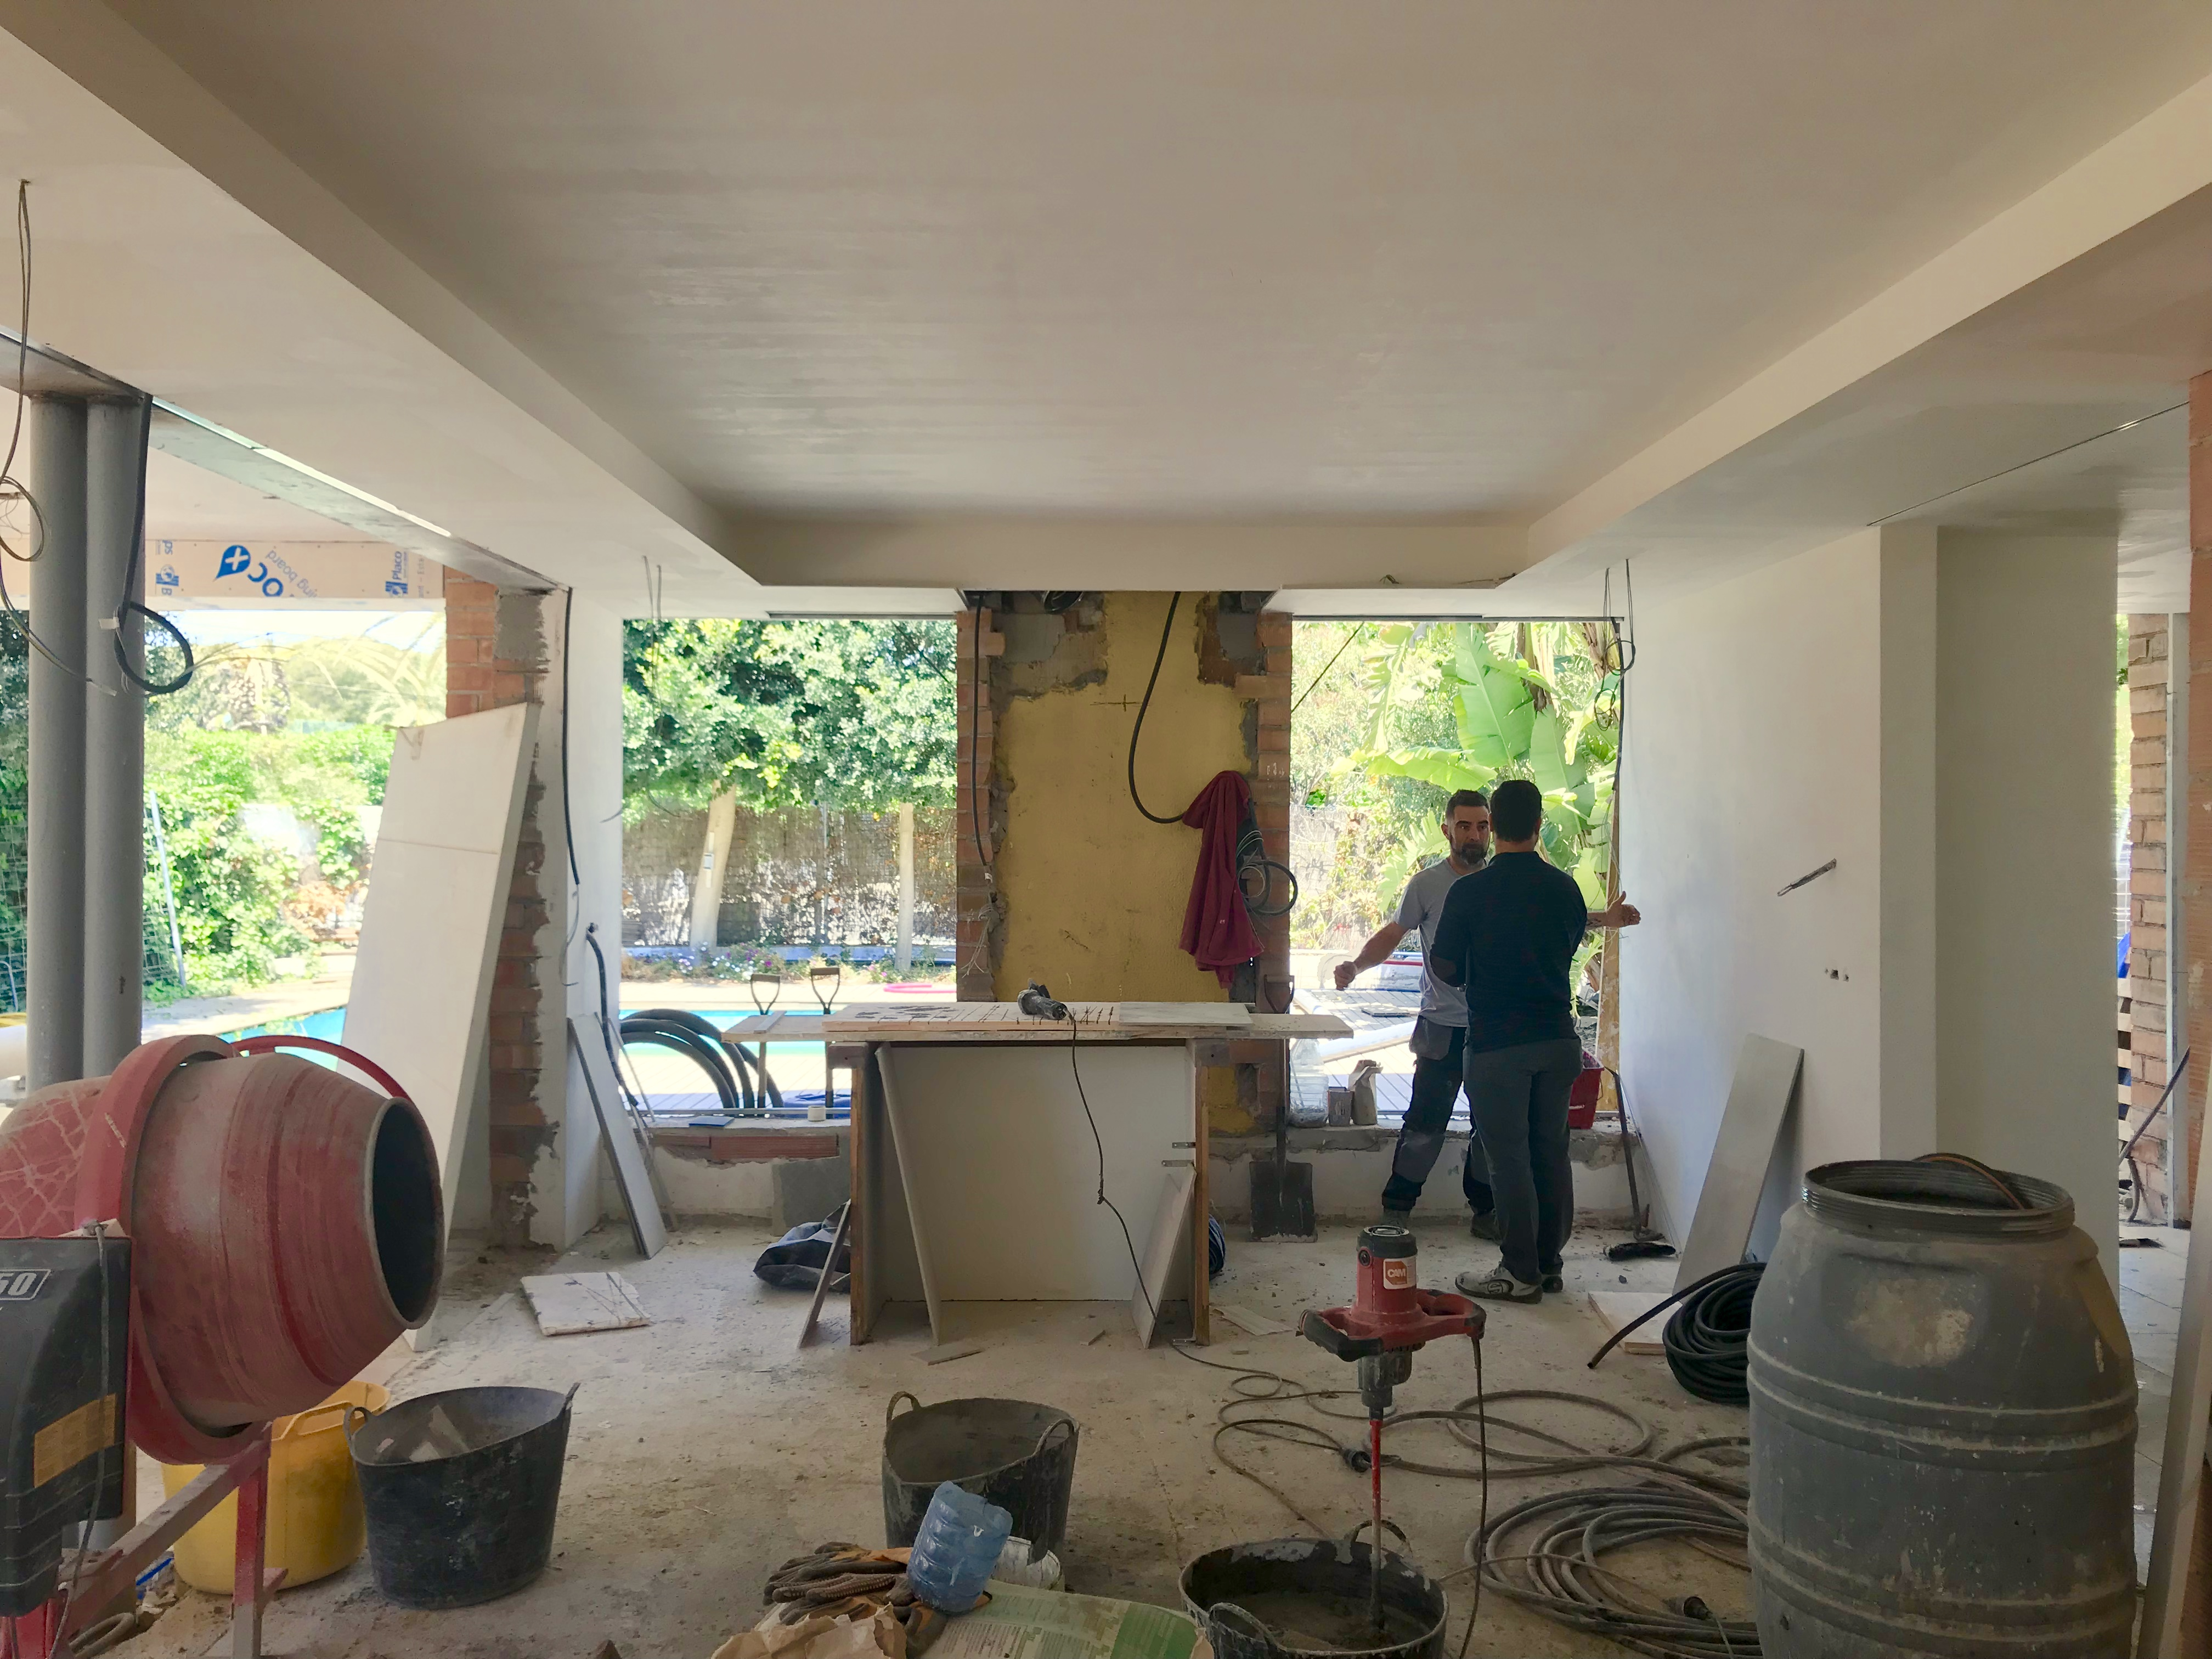 rardo-architects-in-sitges-and-barcelona-new-villa-in-terramar